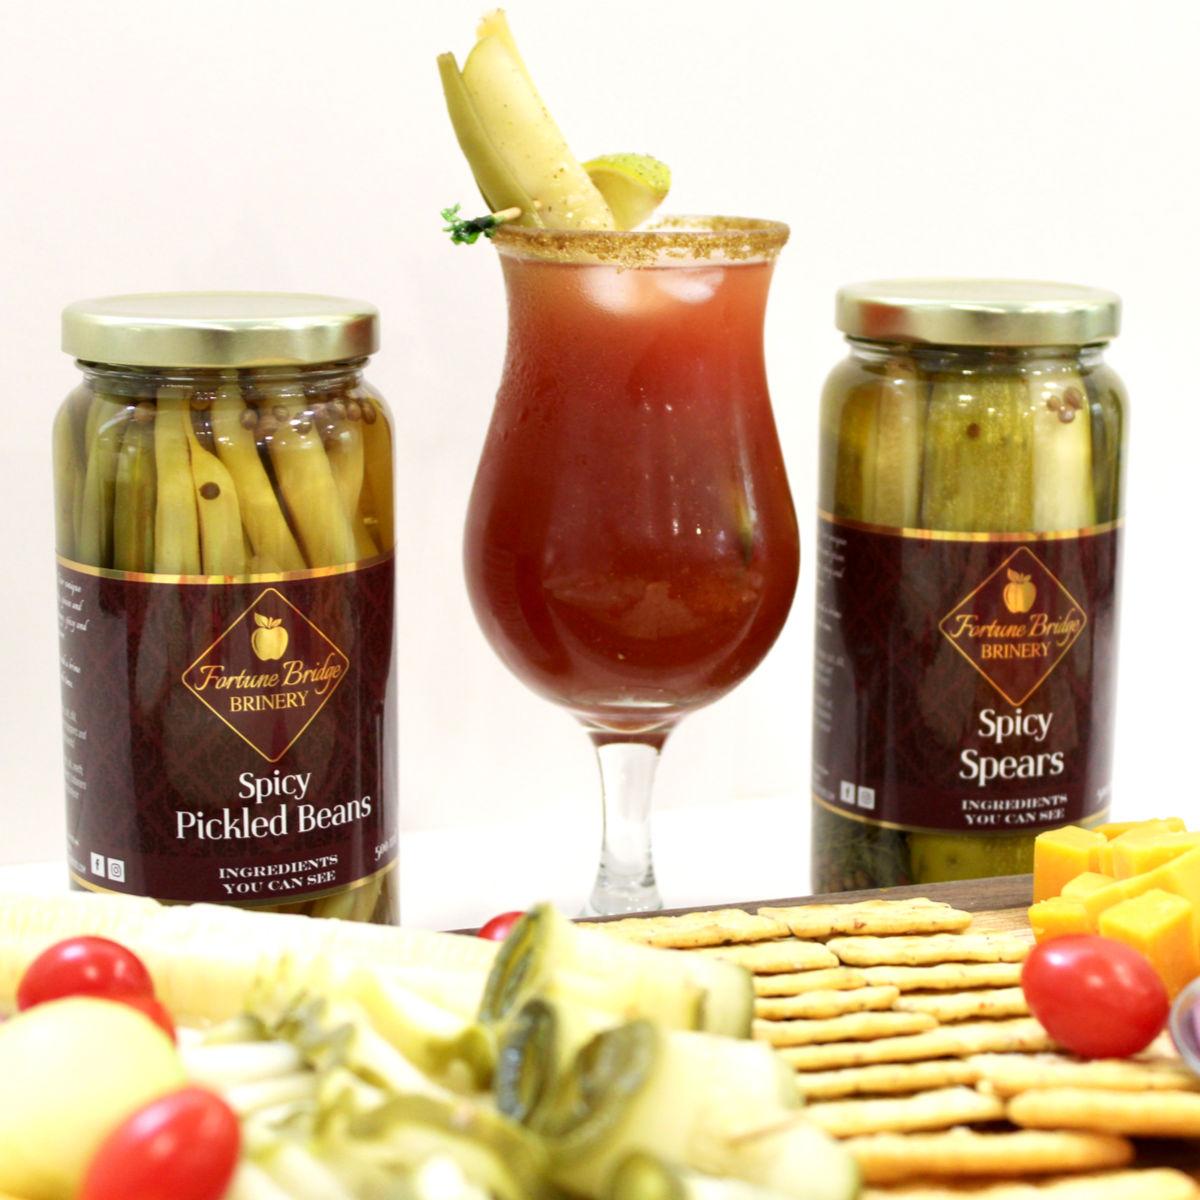 fortune bridge brinery - charcuterie pickles - pei